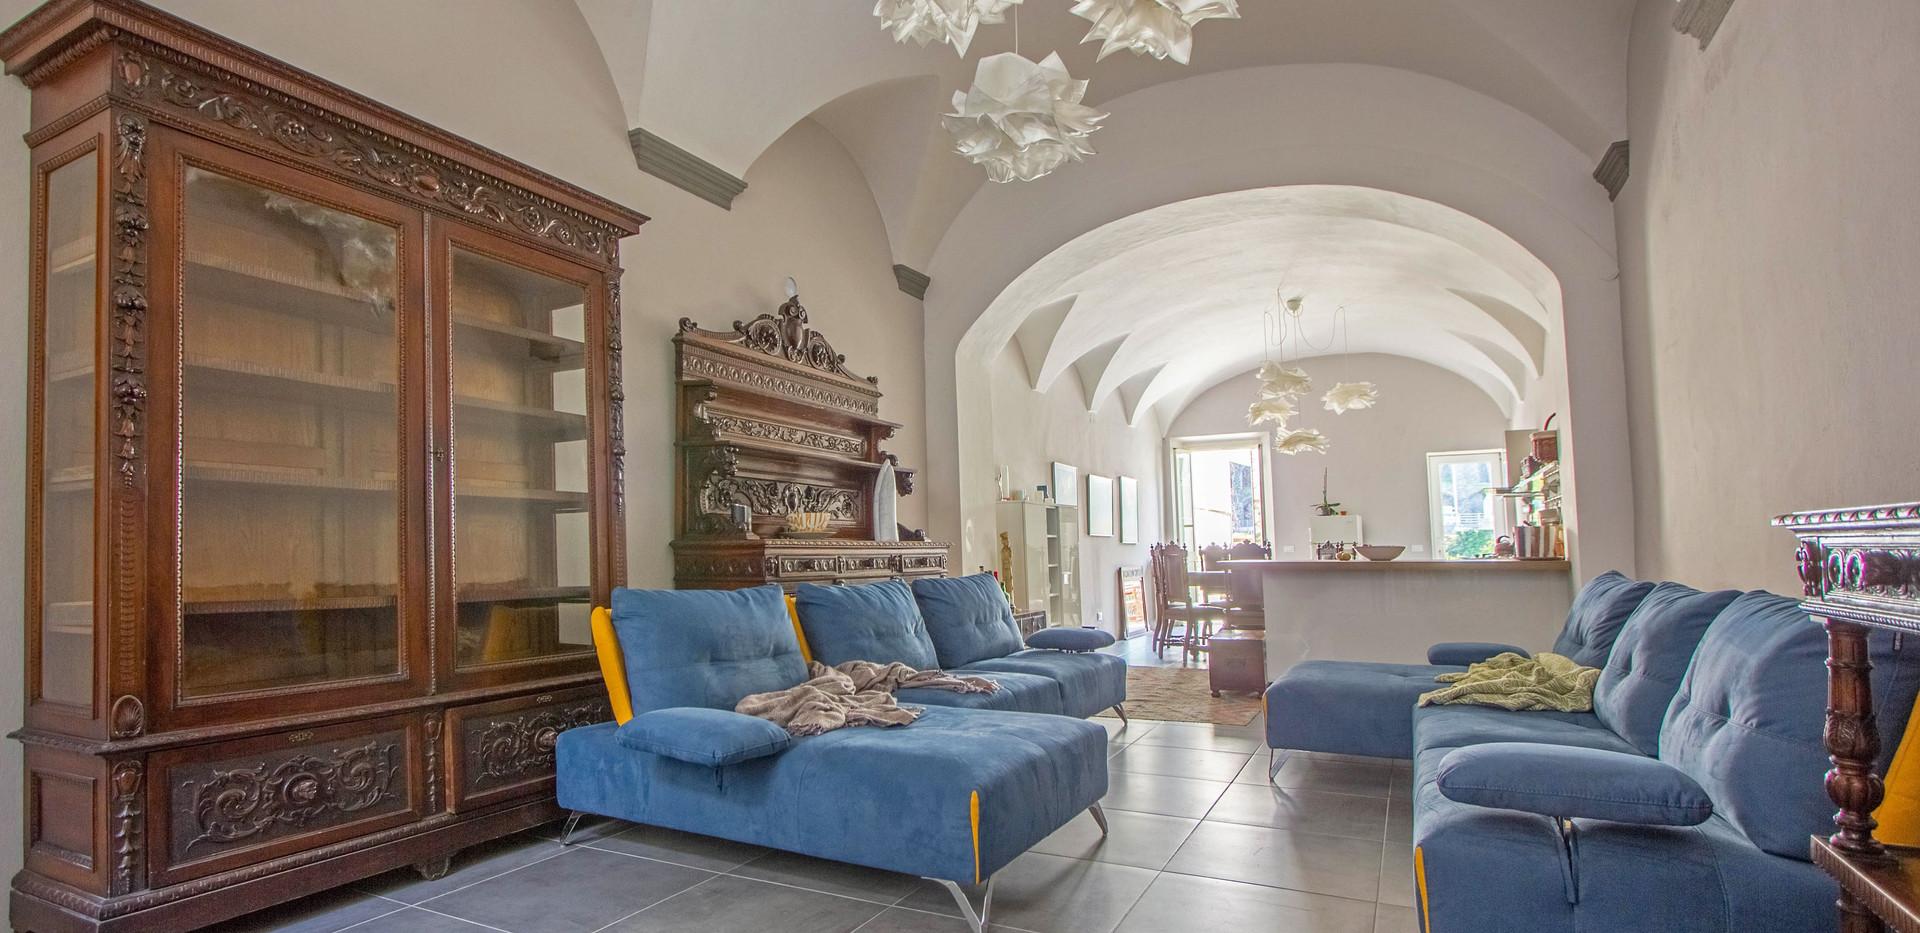 Lo scultore - Pontremoli - Living Room1.